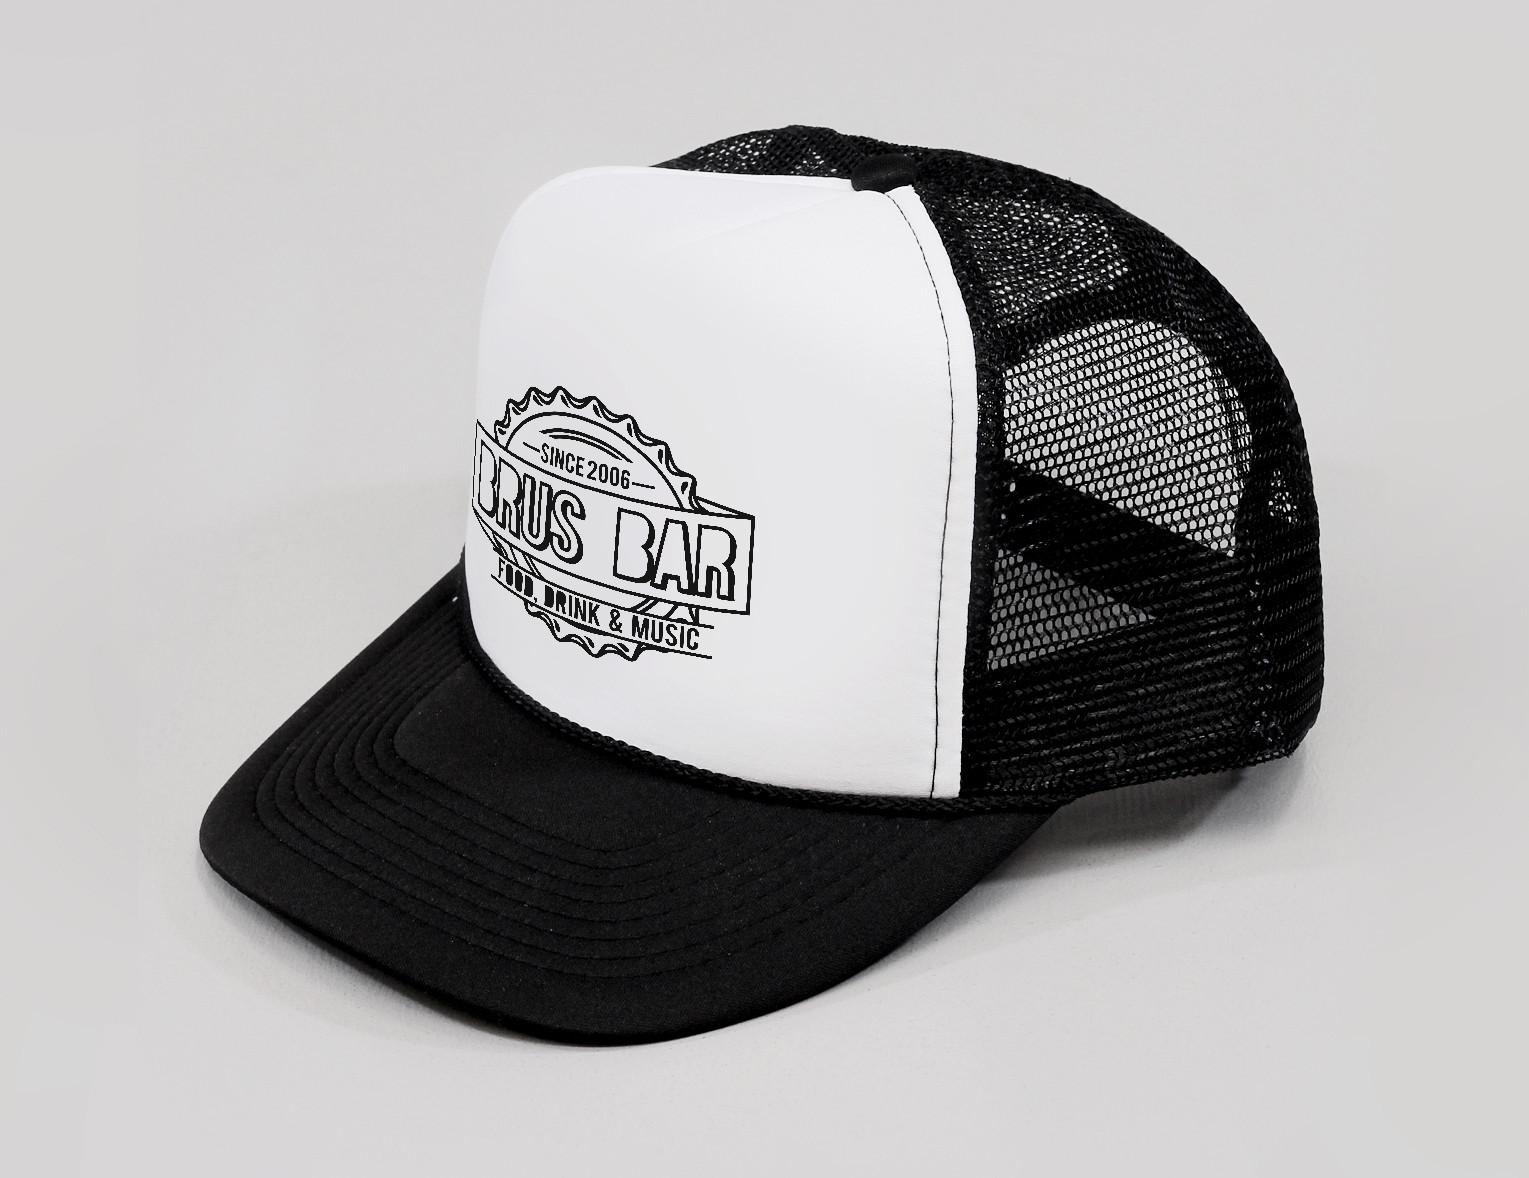 Brus Bar Trucker Hat - MP Grafica